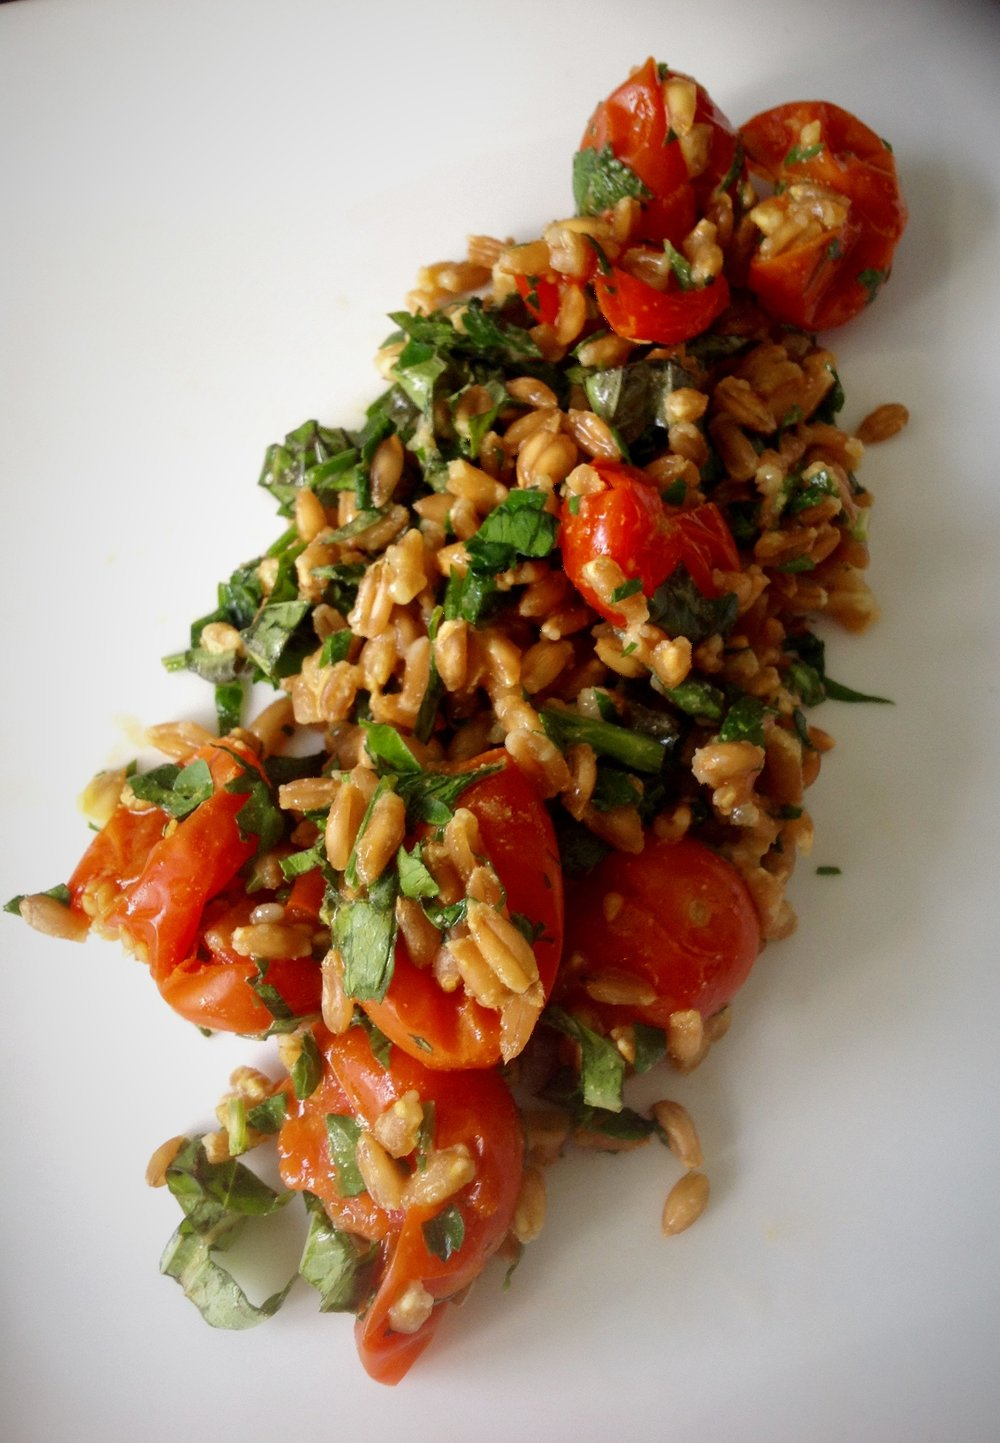 Roasted Tomato Farro Salad - Healthy, Whole Grain, Plant-Based, Oil-Free, Heirloom, Organic, Vegan